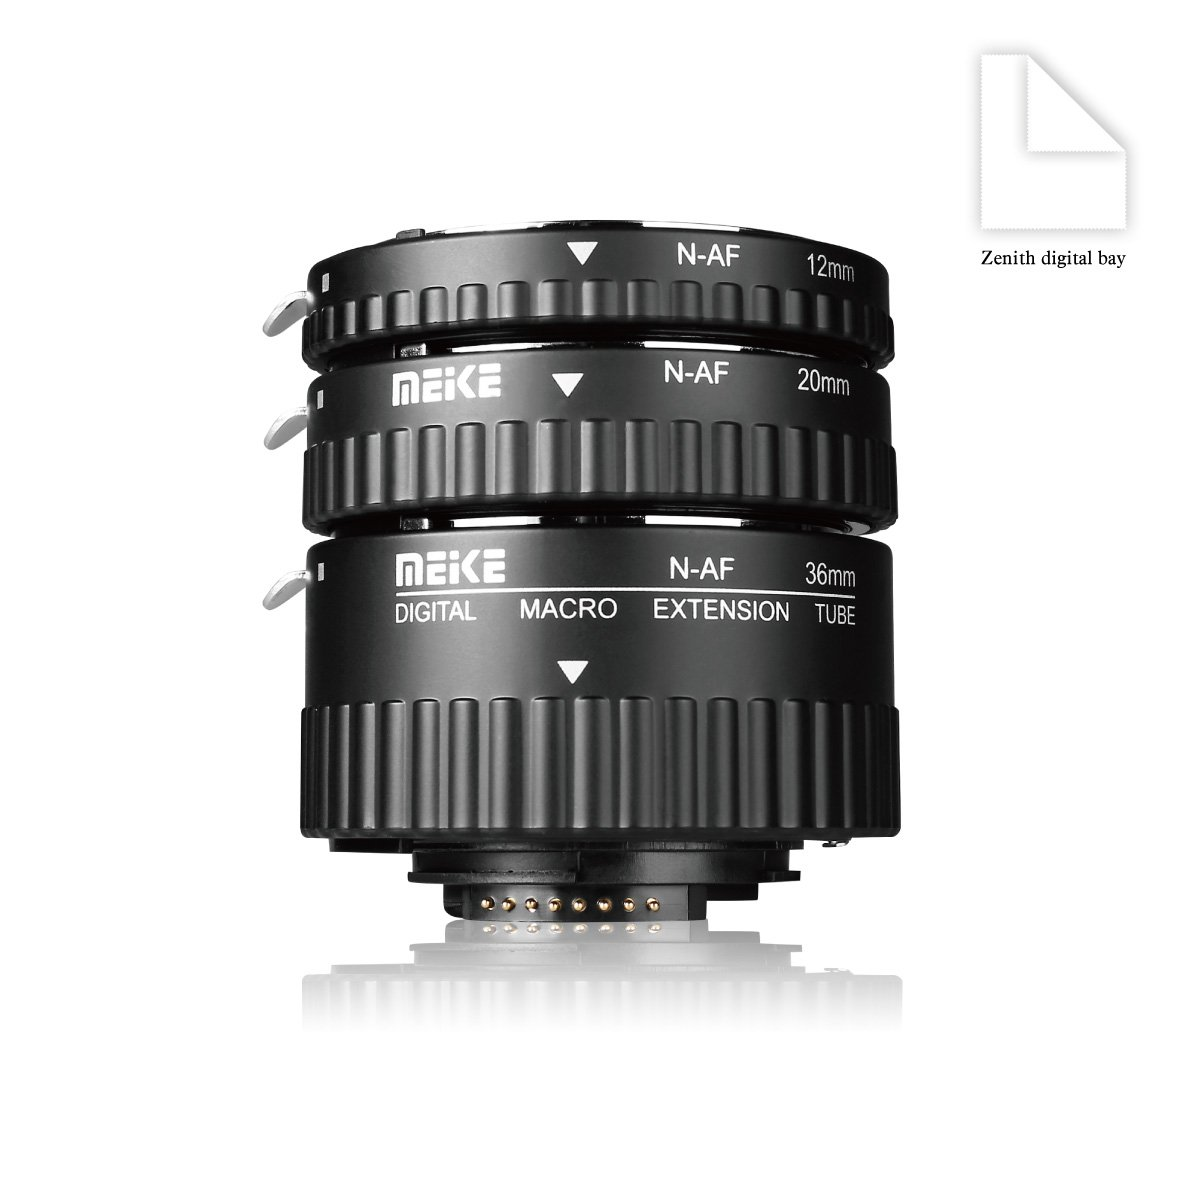 Meike mk-n-af1-b plastica elettronica supporto tubo di prolunga macro auto Foucs adattatore per fotocamere DSLR e Nikkor AF AF-S g ed VR serie D Nikon D80/D90/D300/D300SD800/D3100/D3200/D5000/D51000/D5200/D7000/&